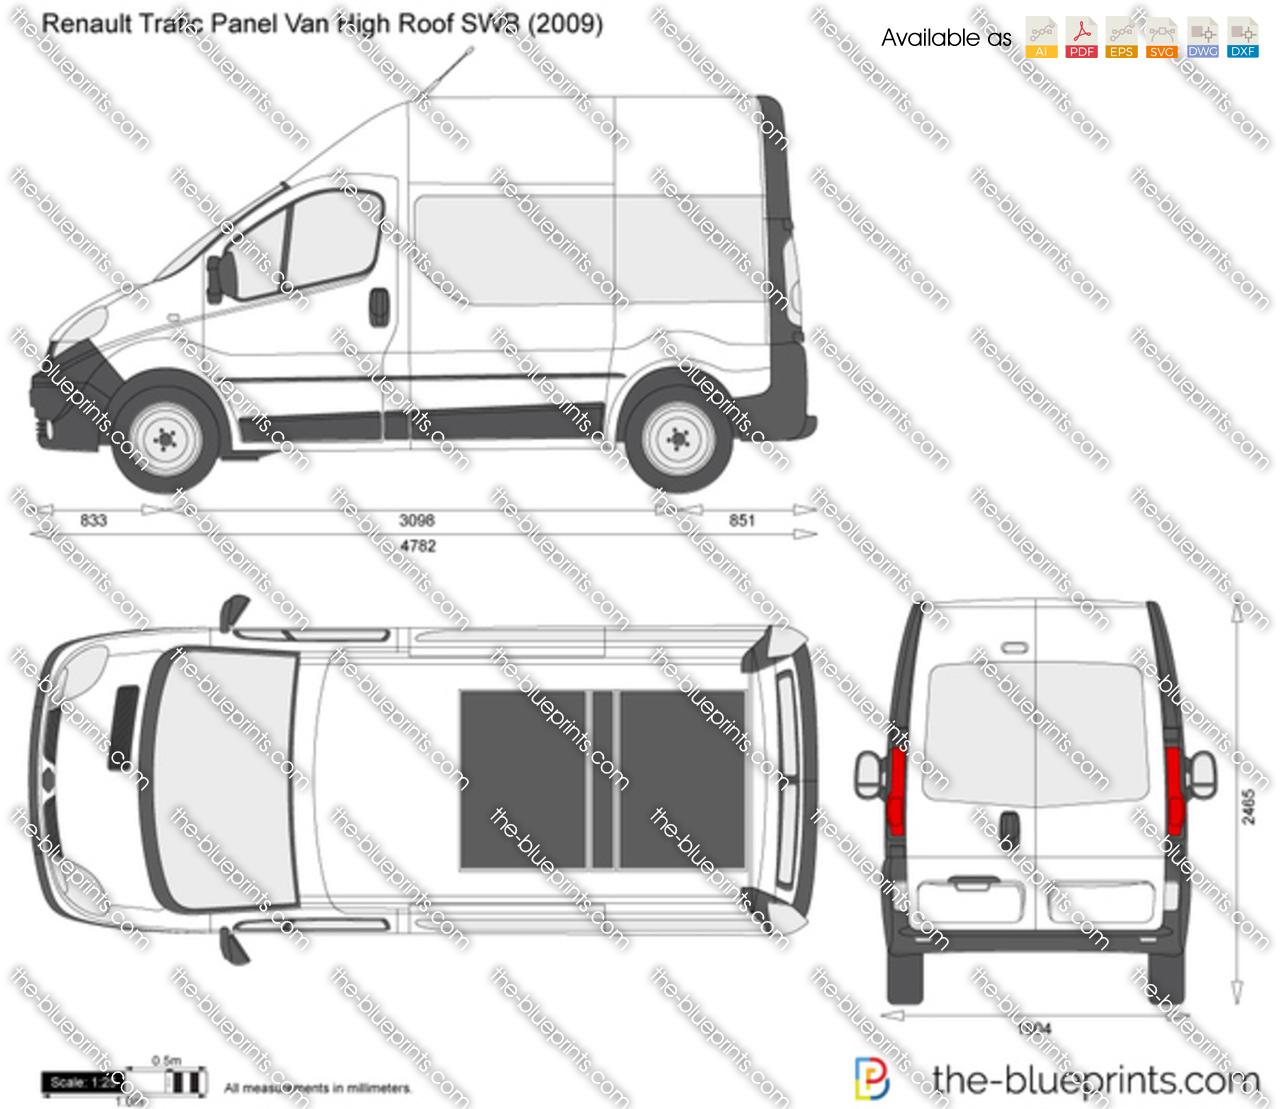 Renault Trafic Panel Van High Roof SWB